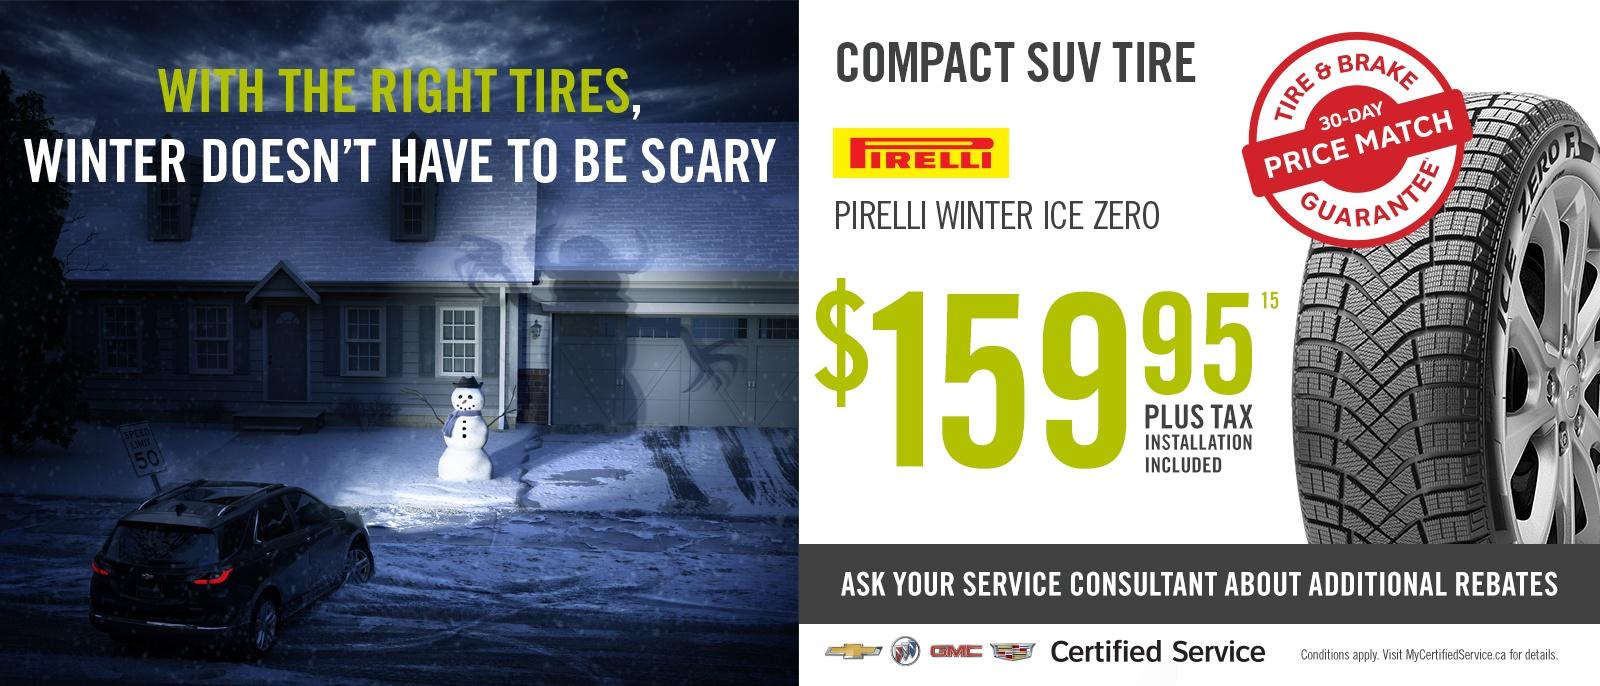 Winter Tire Specials SUVs